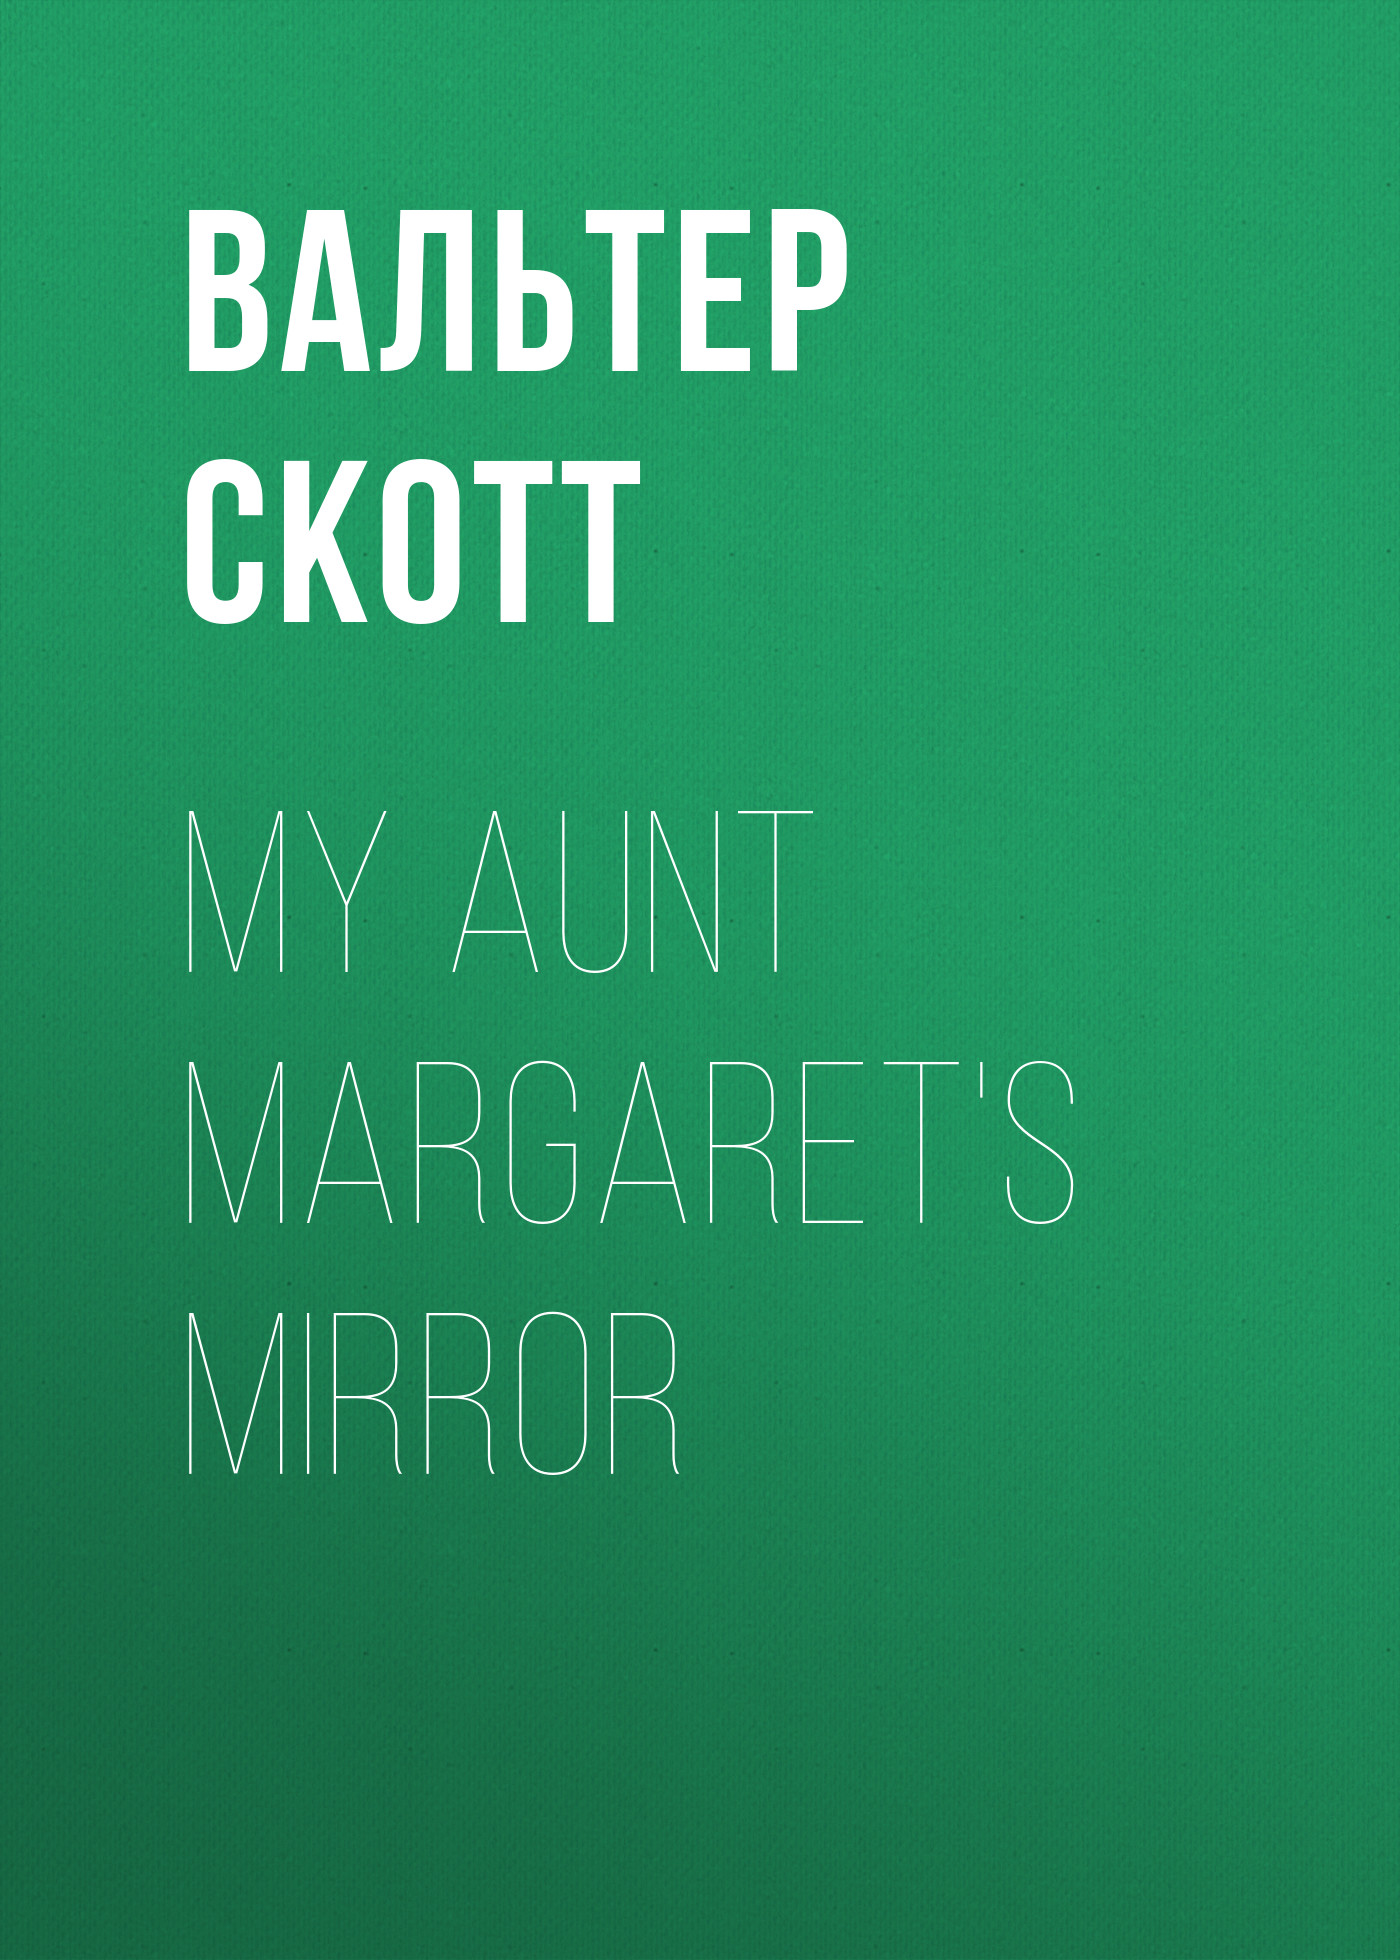 Вальтер Скотт My Aunt Margaret's Mirror цена